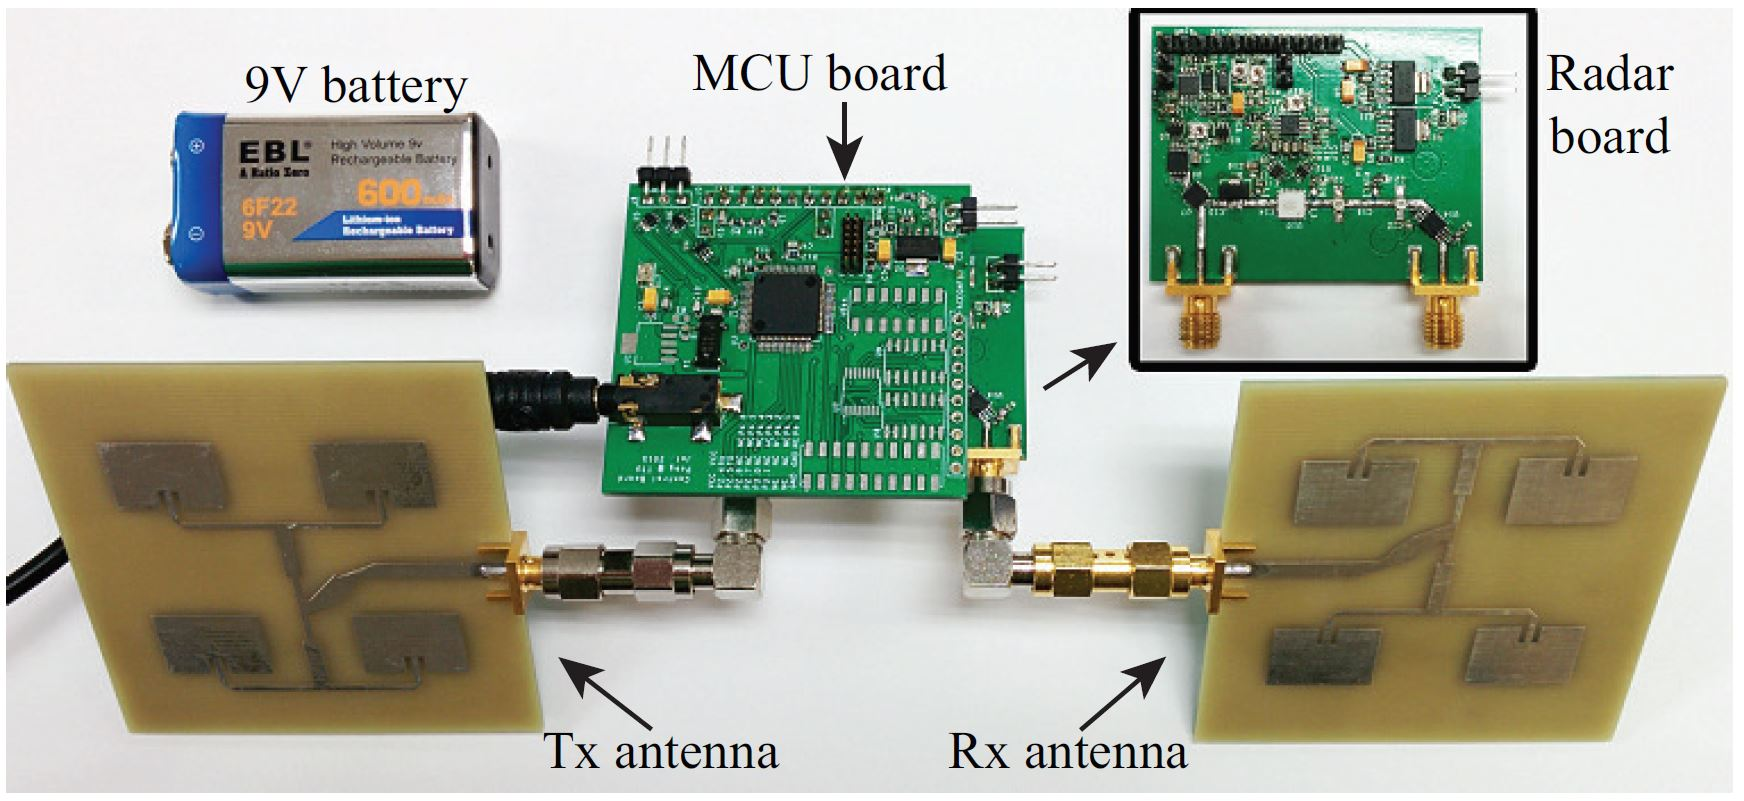 Fig. 2. Photo of the 5.8-GHz multi-mode radar prototype